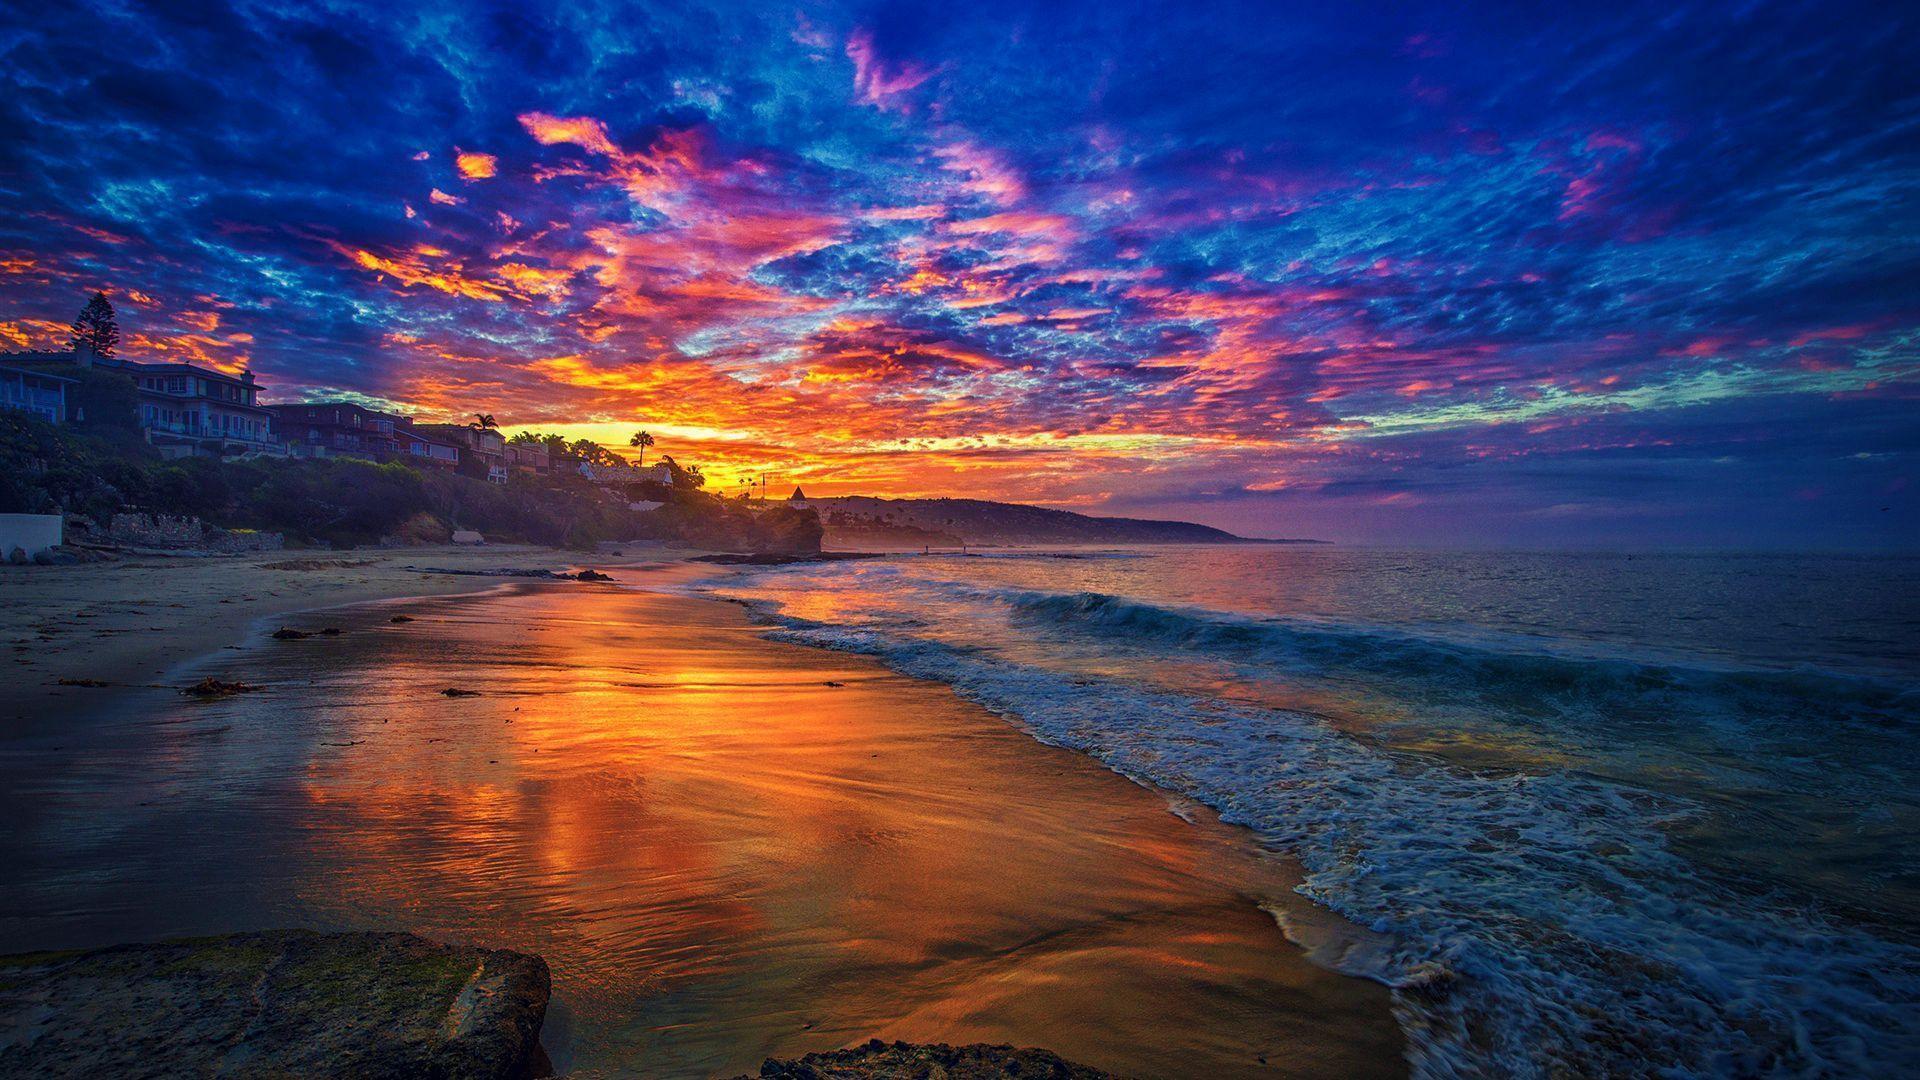 Sunrise Beach Wallpaper Hd